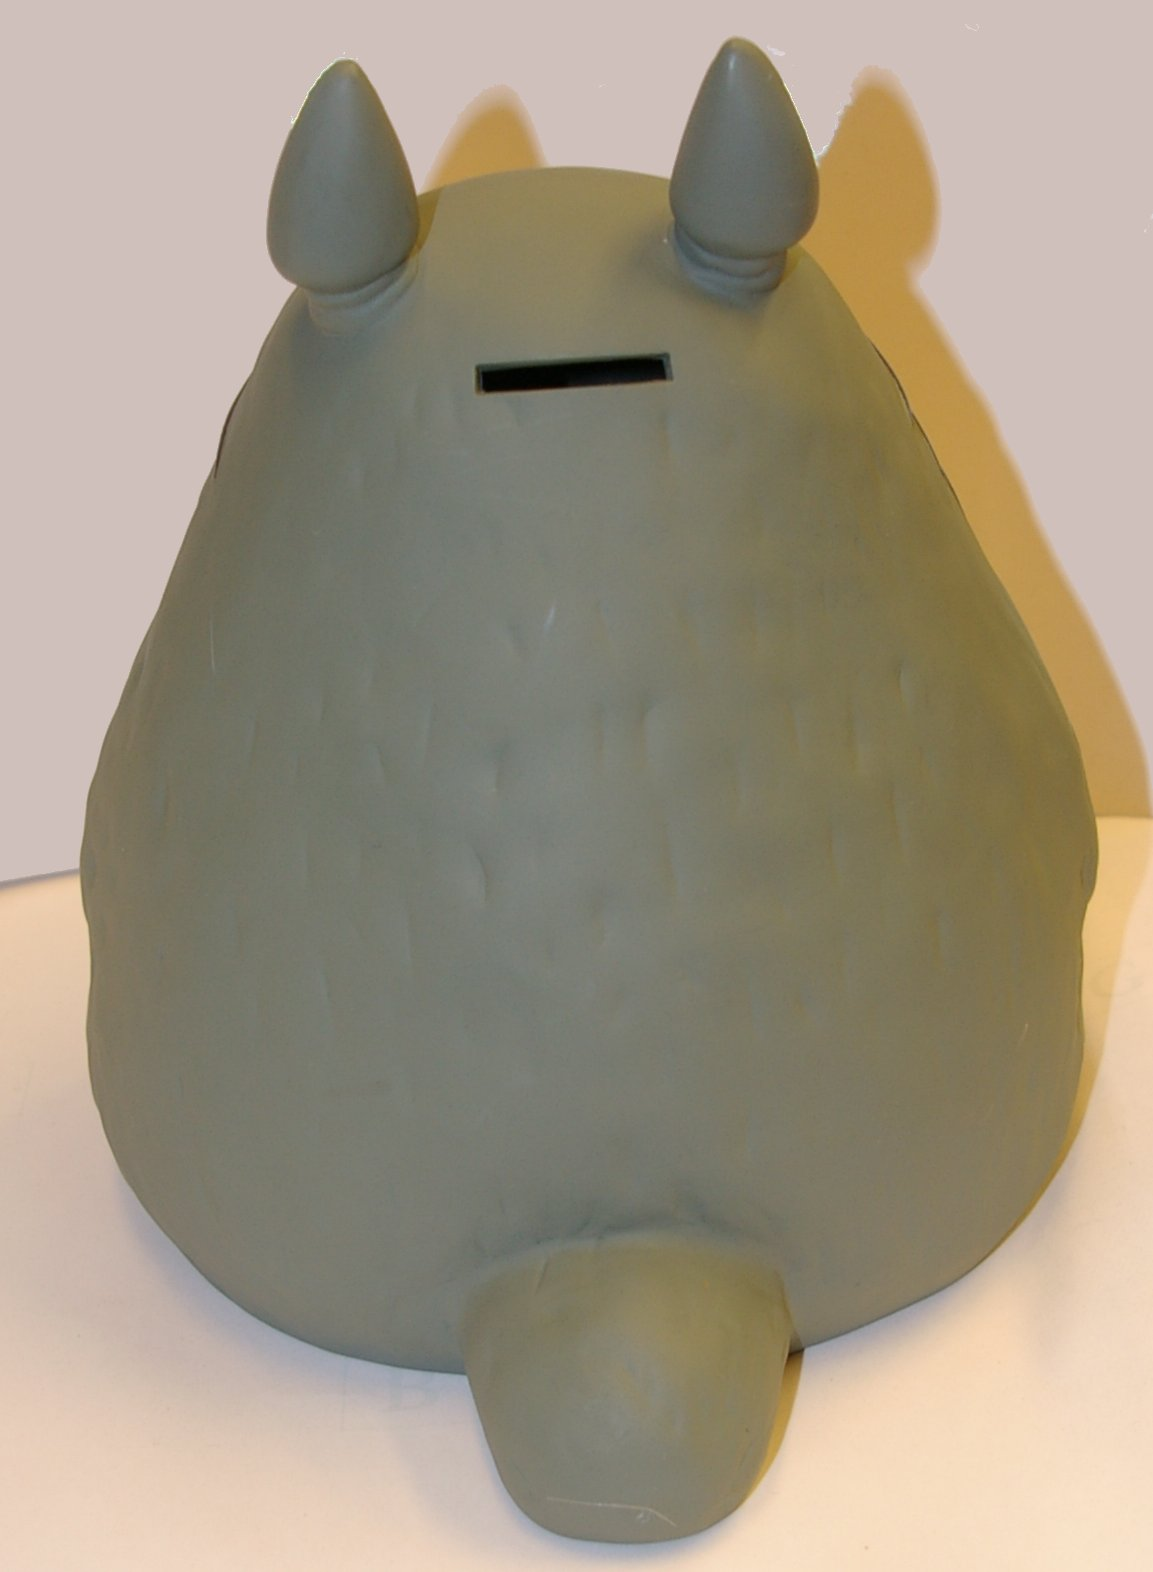 Derrière de la tirelire Totoro